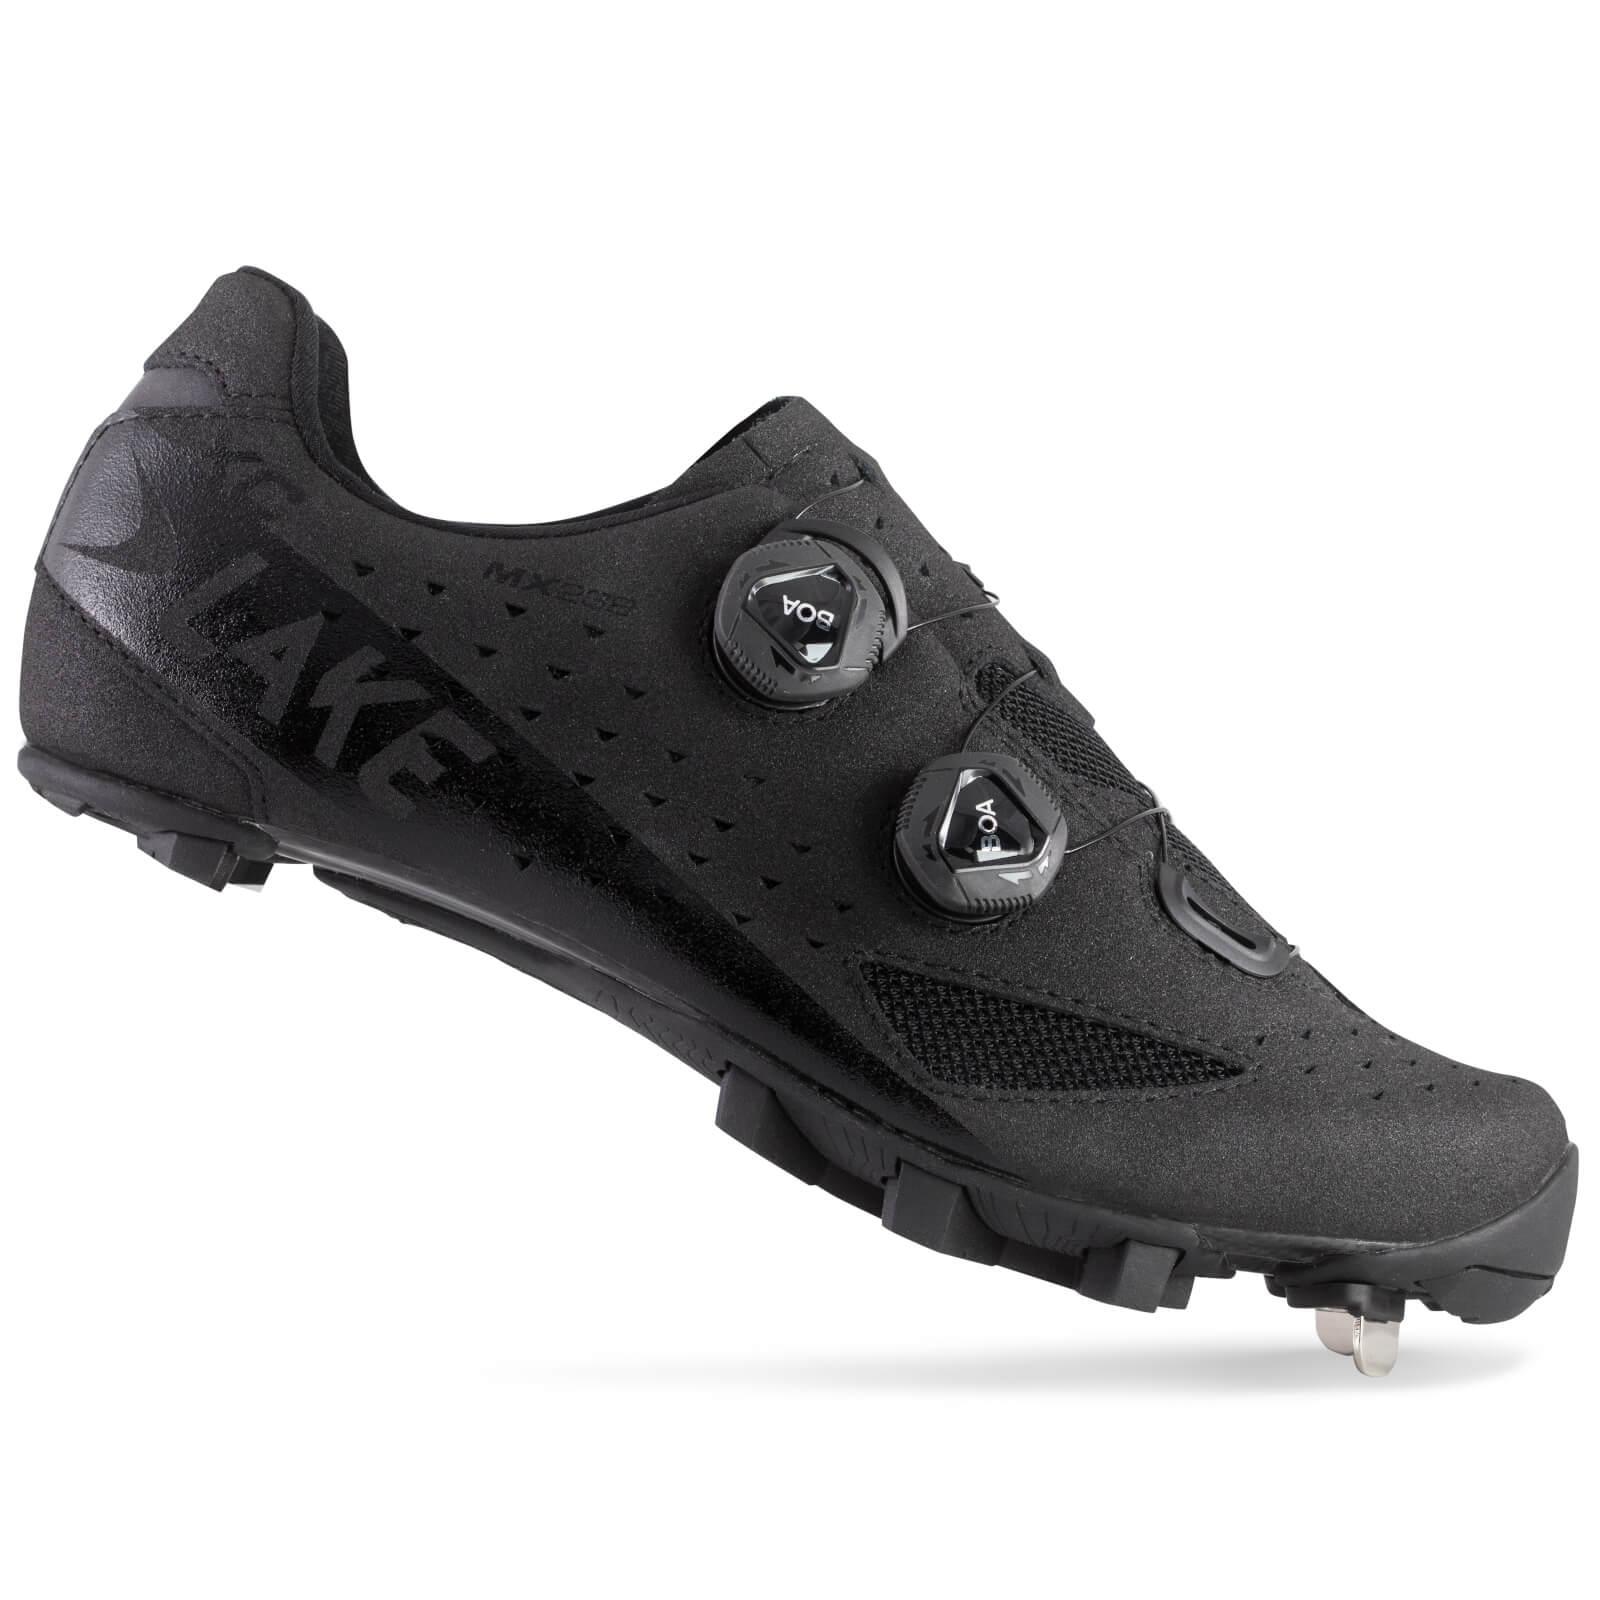 Lake MX238 XC Shoes - EU 45.5